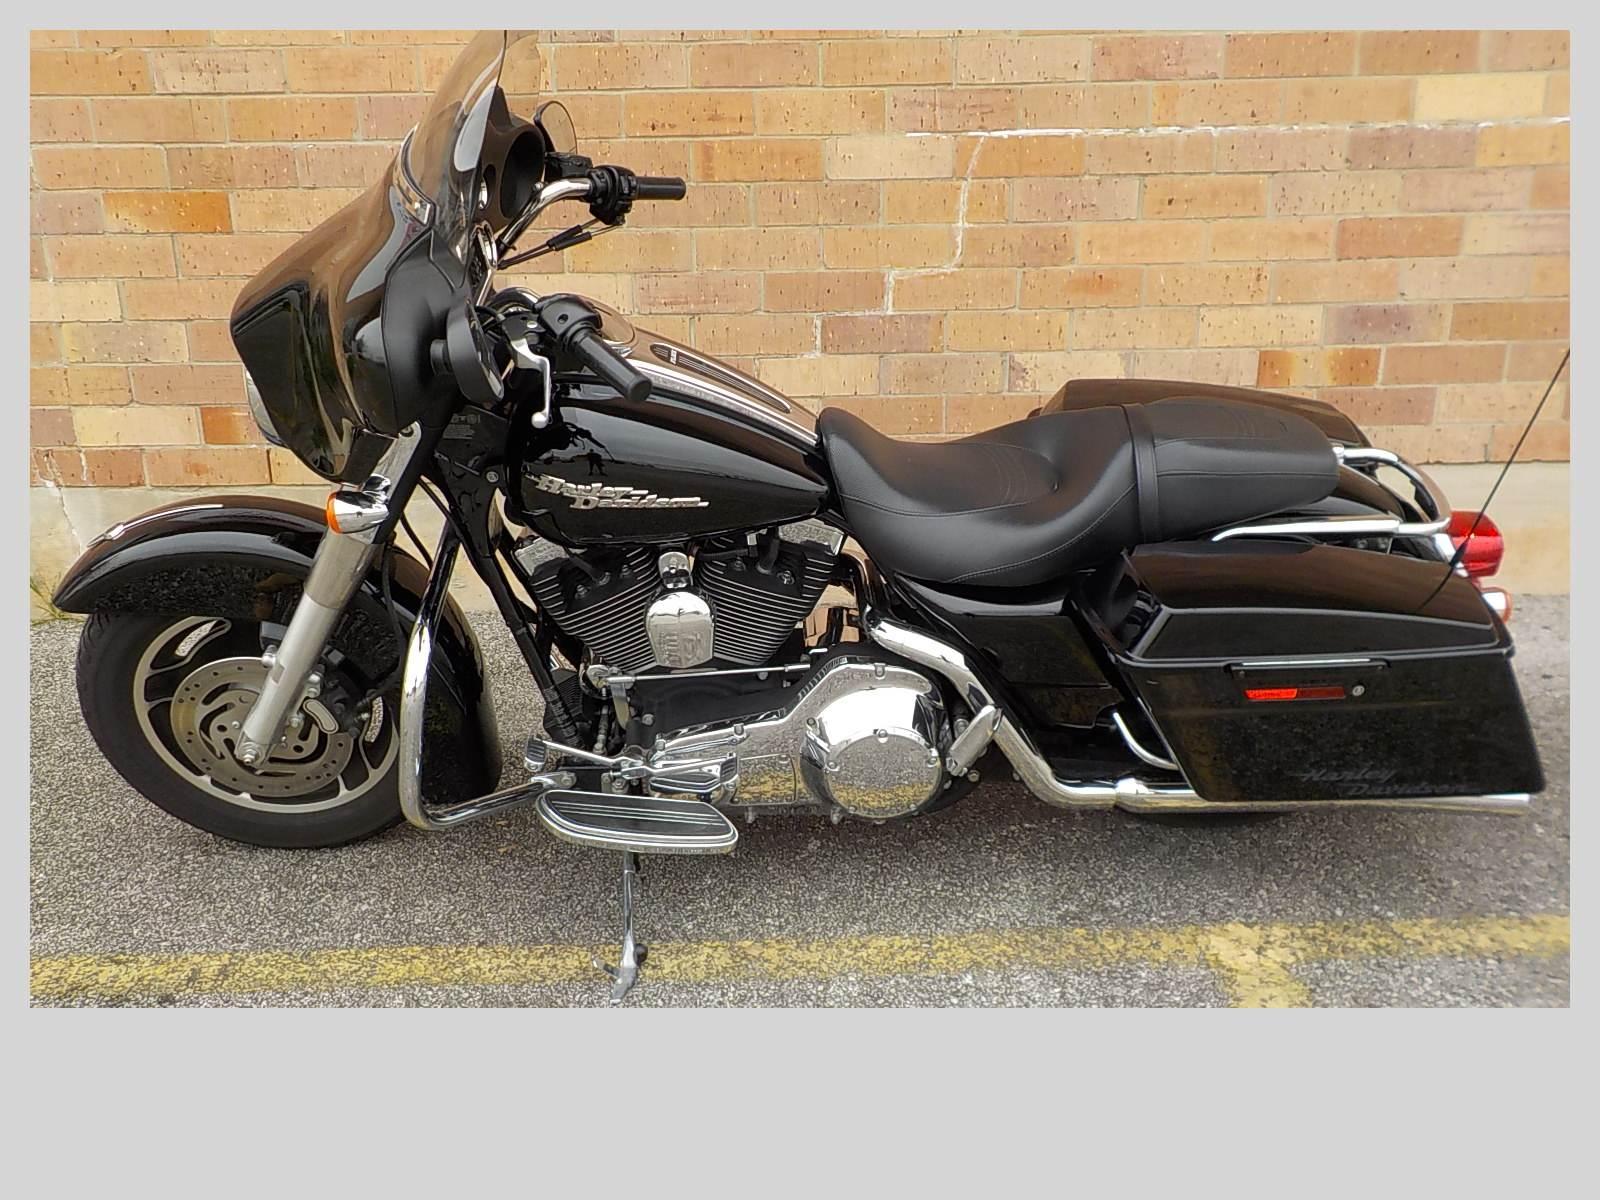 2006 Harley-Davidson Street Glide 2